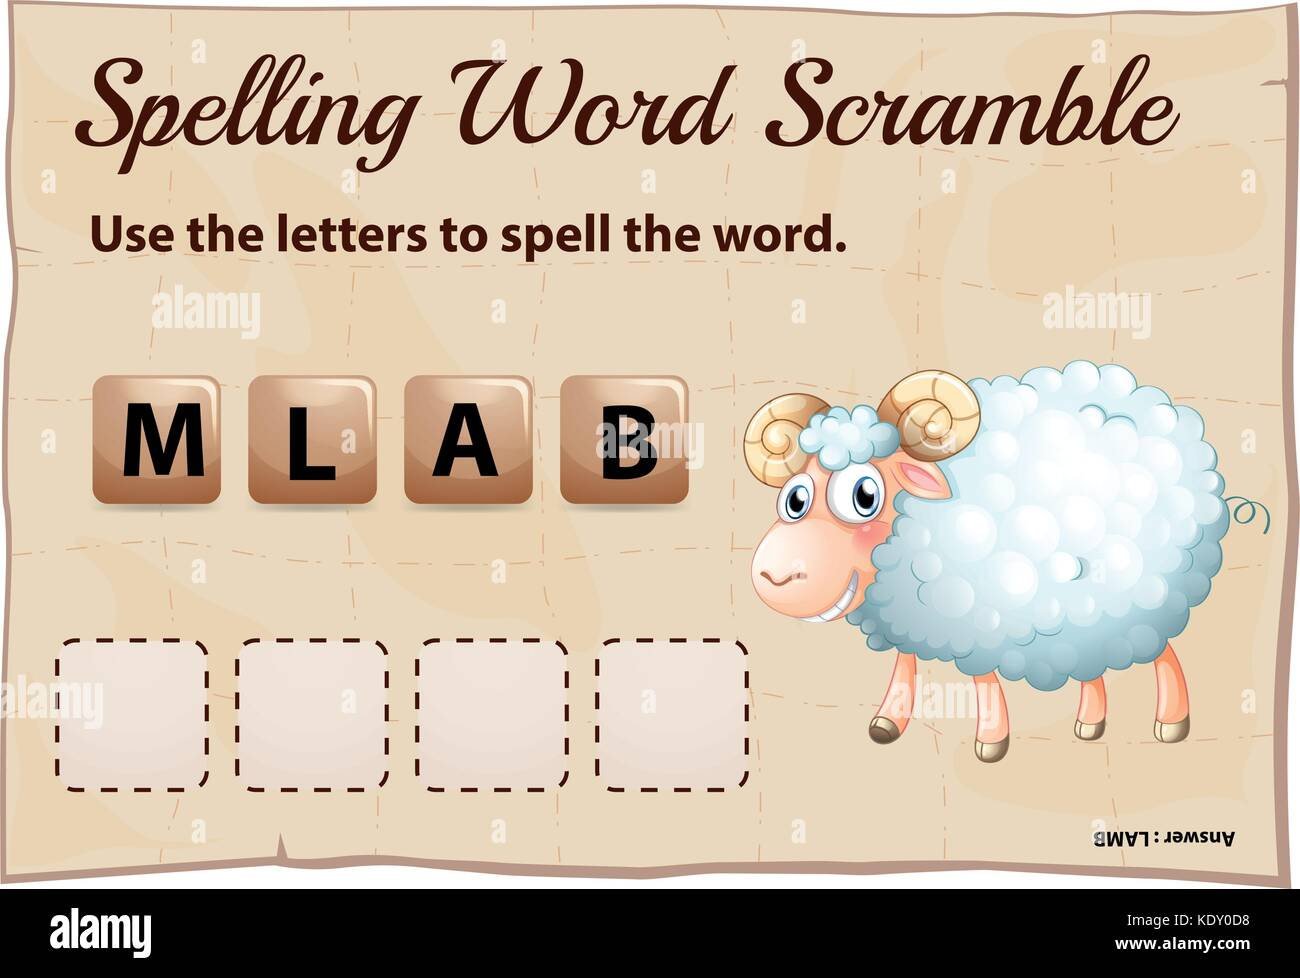 Spelling word scramble for word lamb illustration - Stock Vector